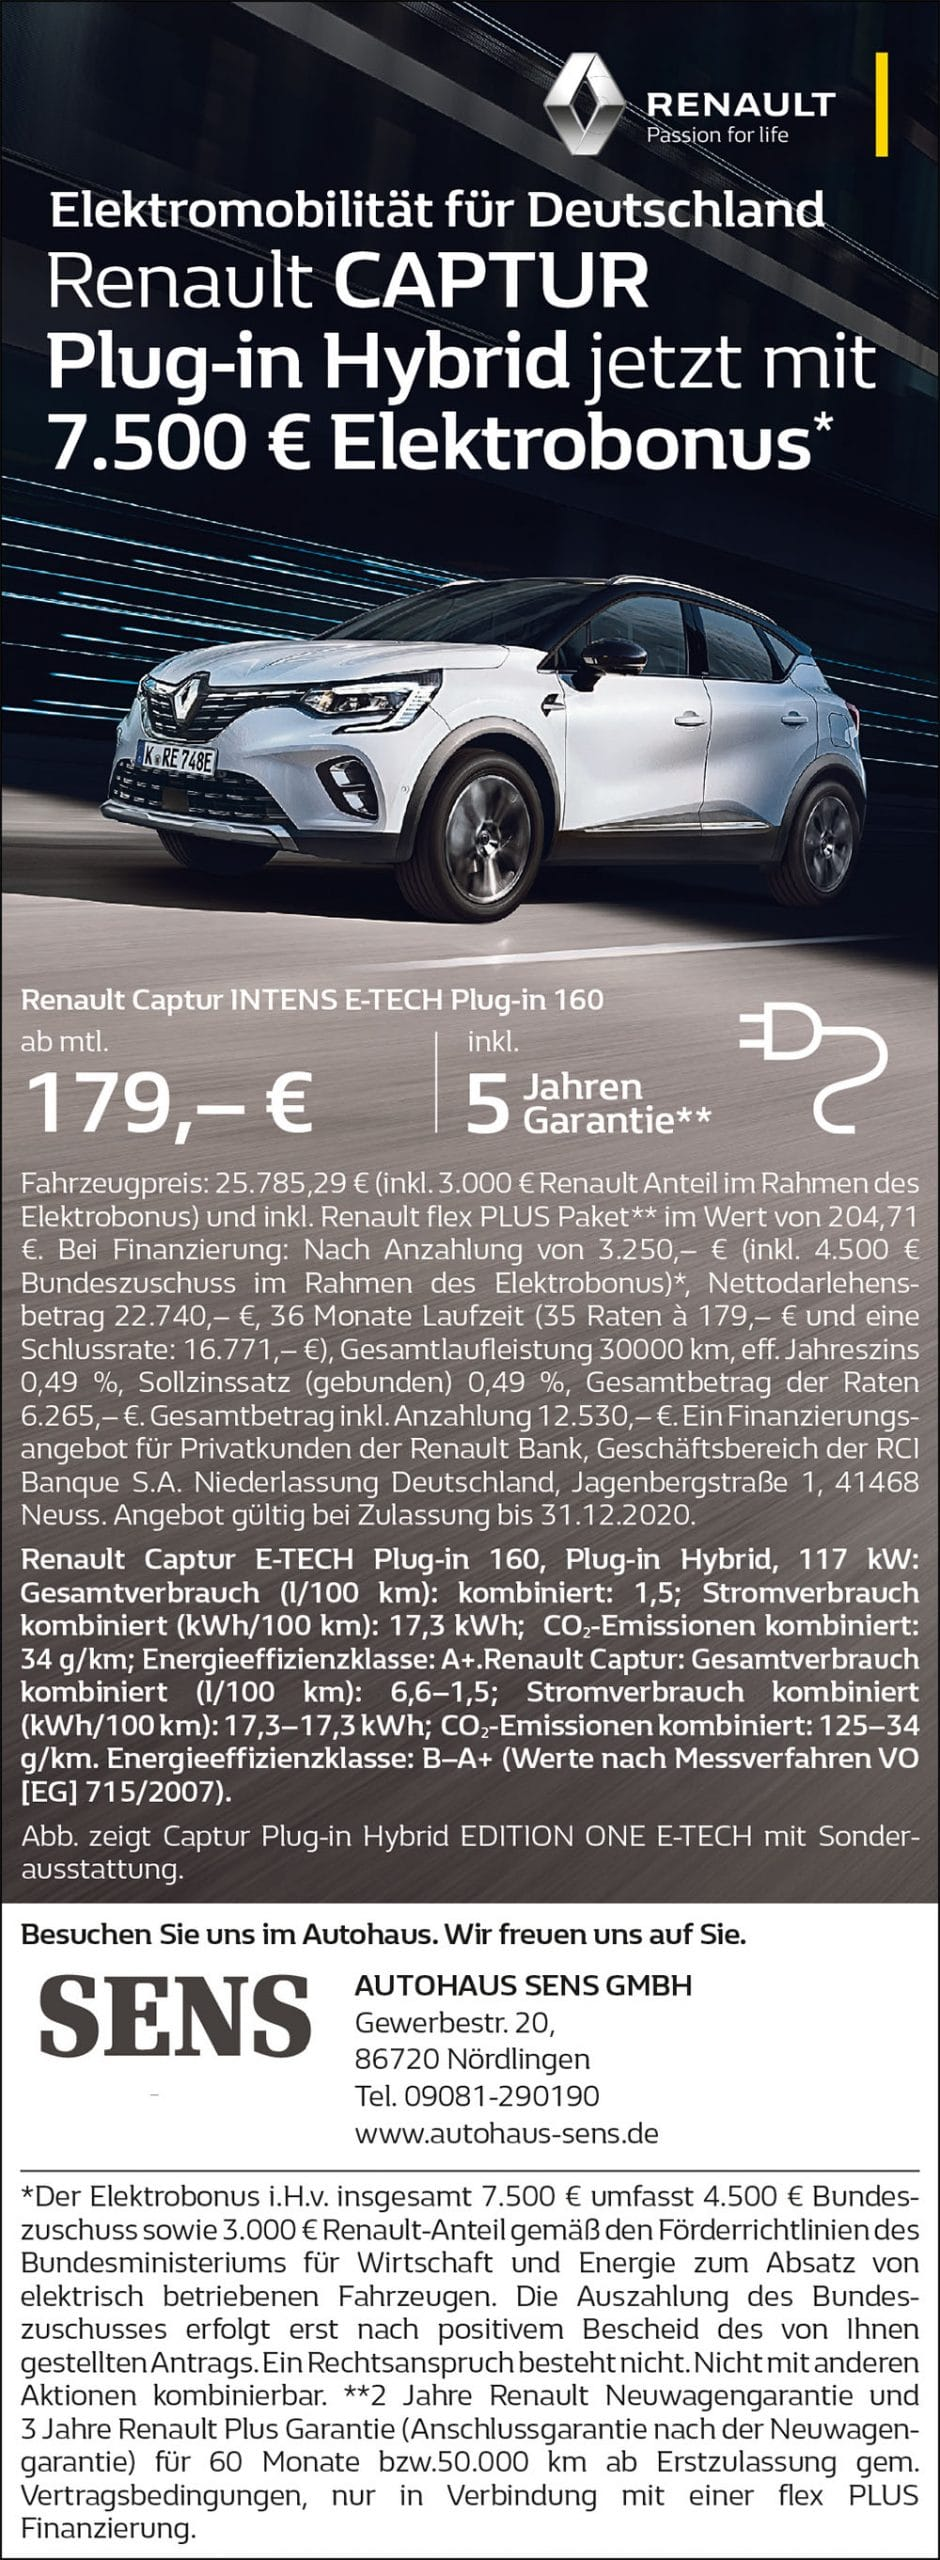 Renault CAPTUR Plug-in Hybrid jetzt mit 7.500€ Elektrobonus